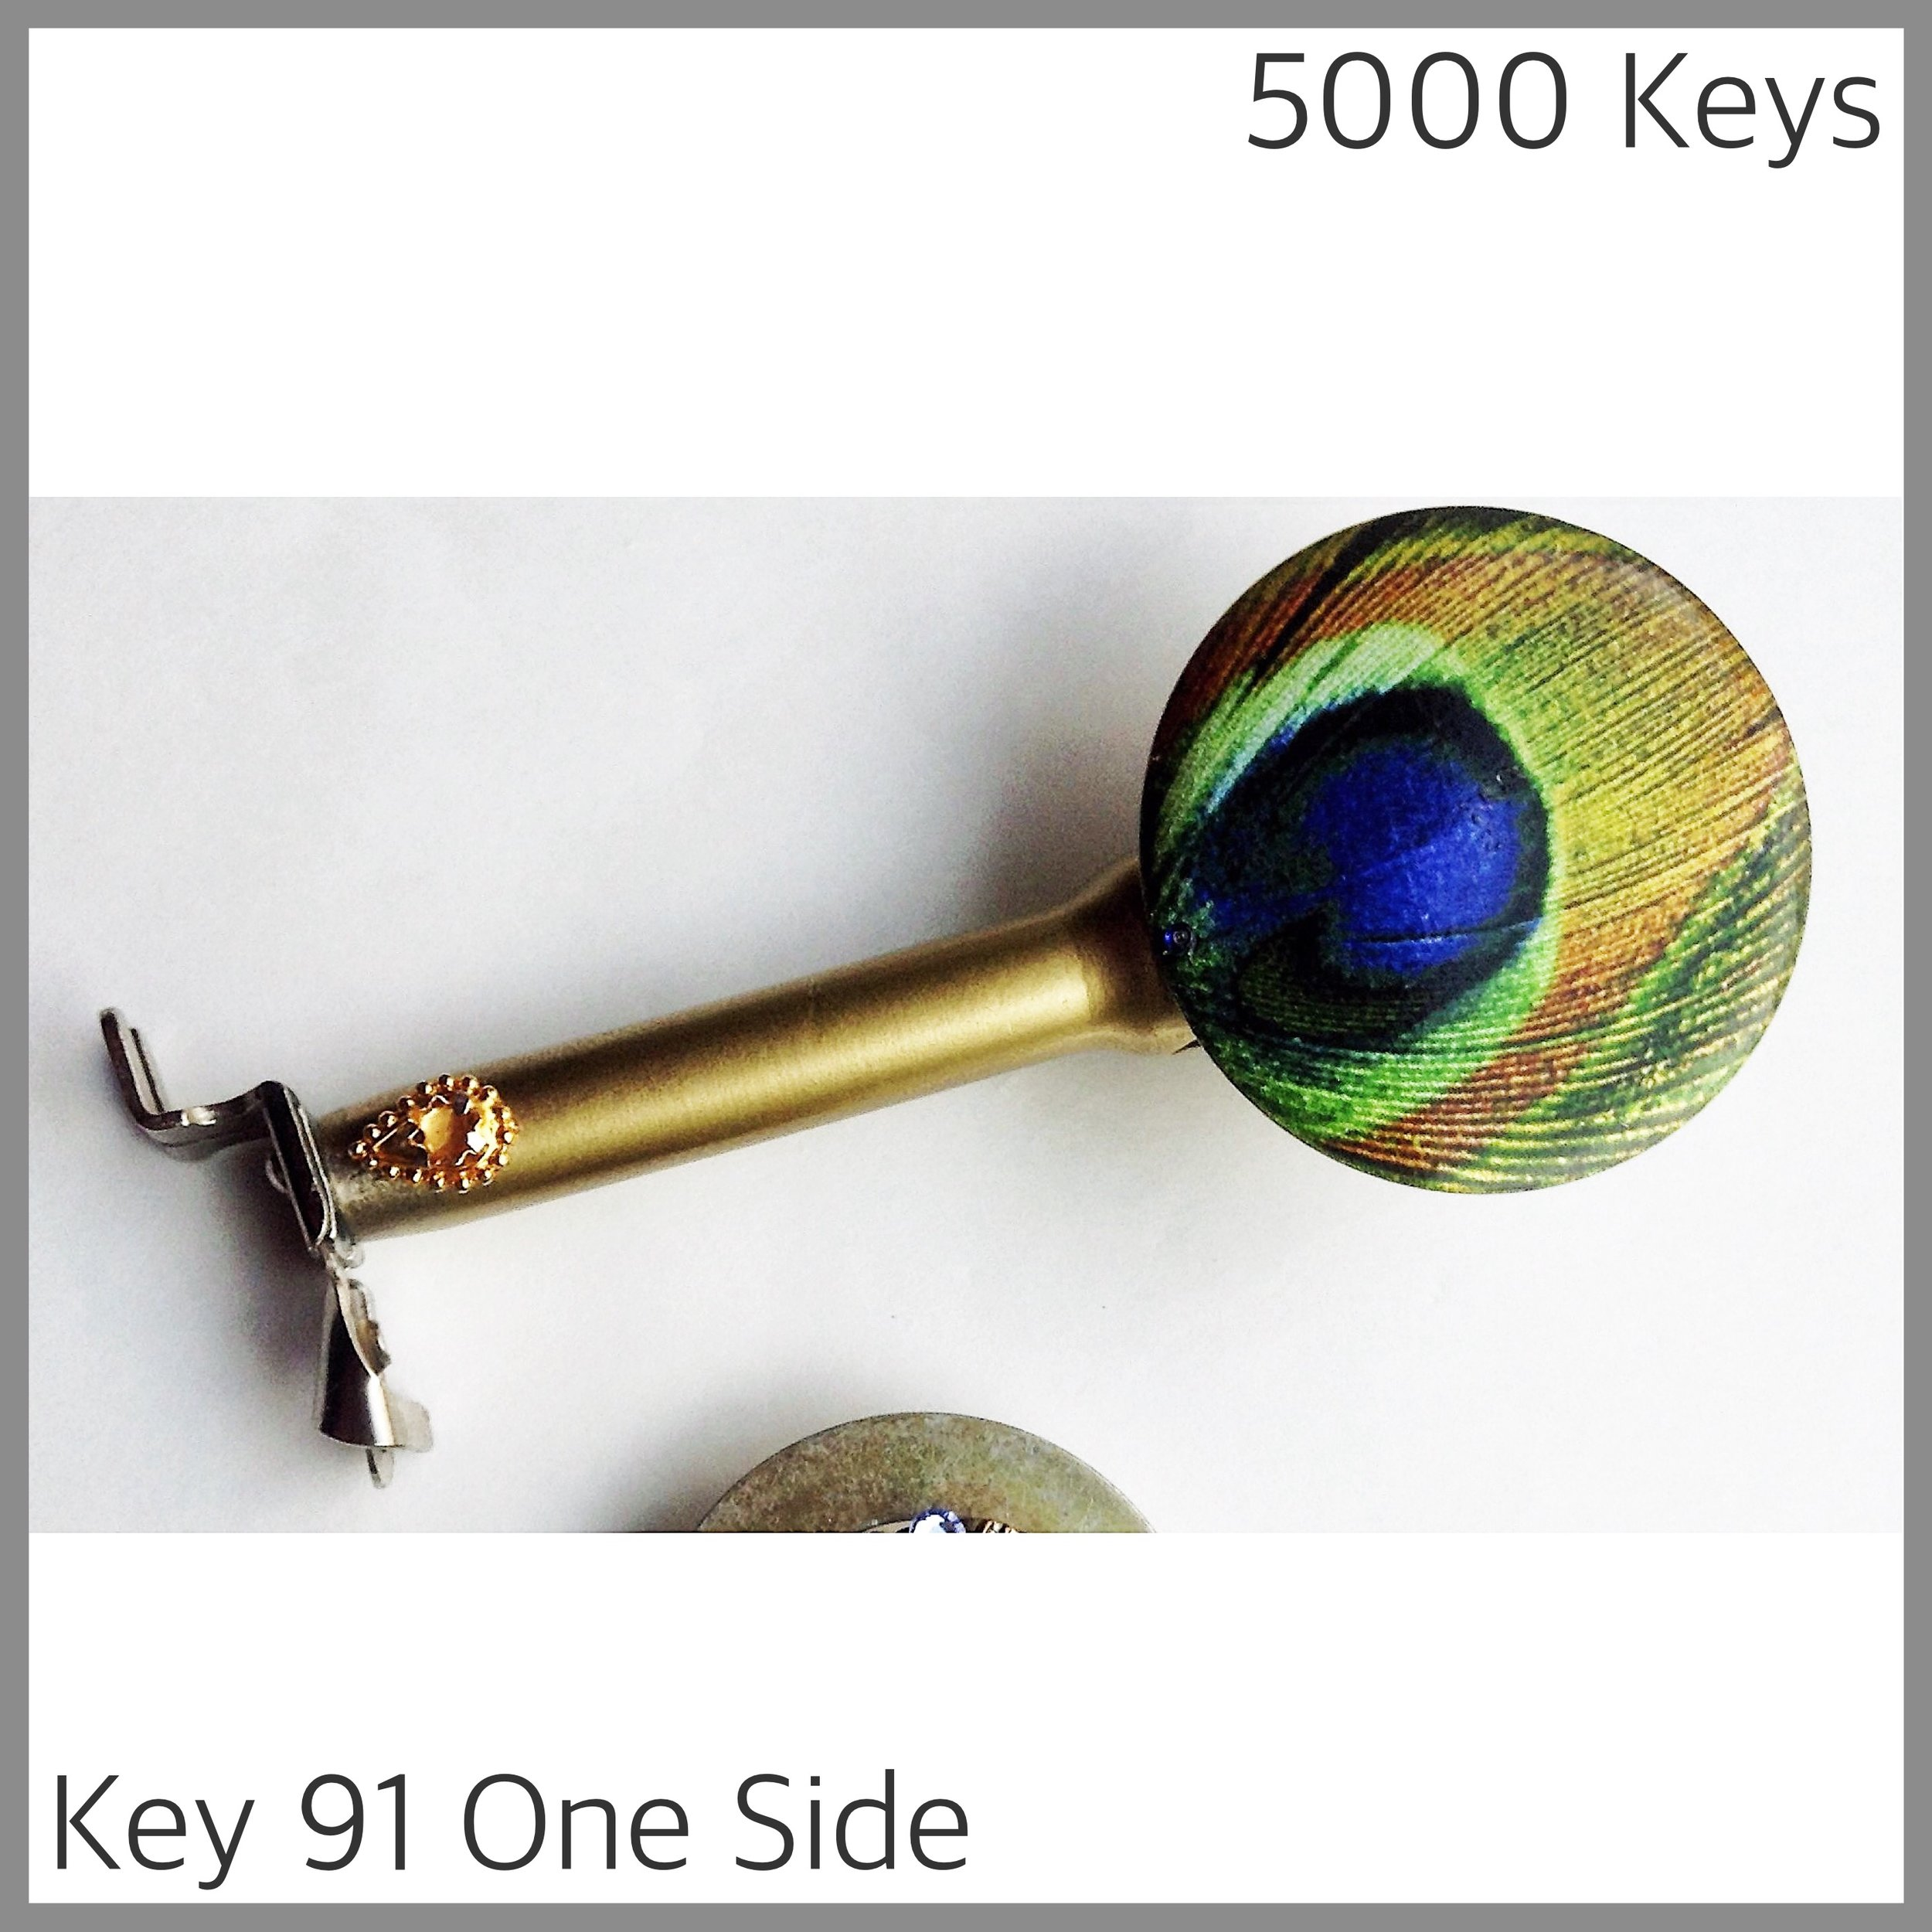 Key 91 one side.JPG